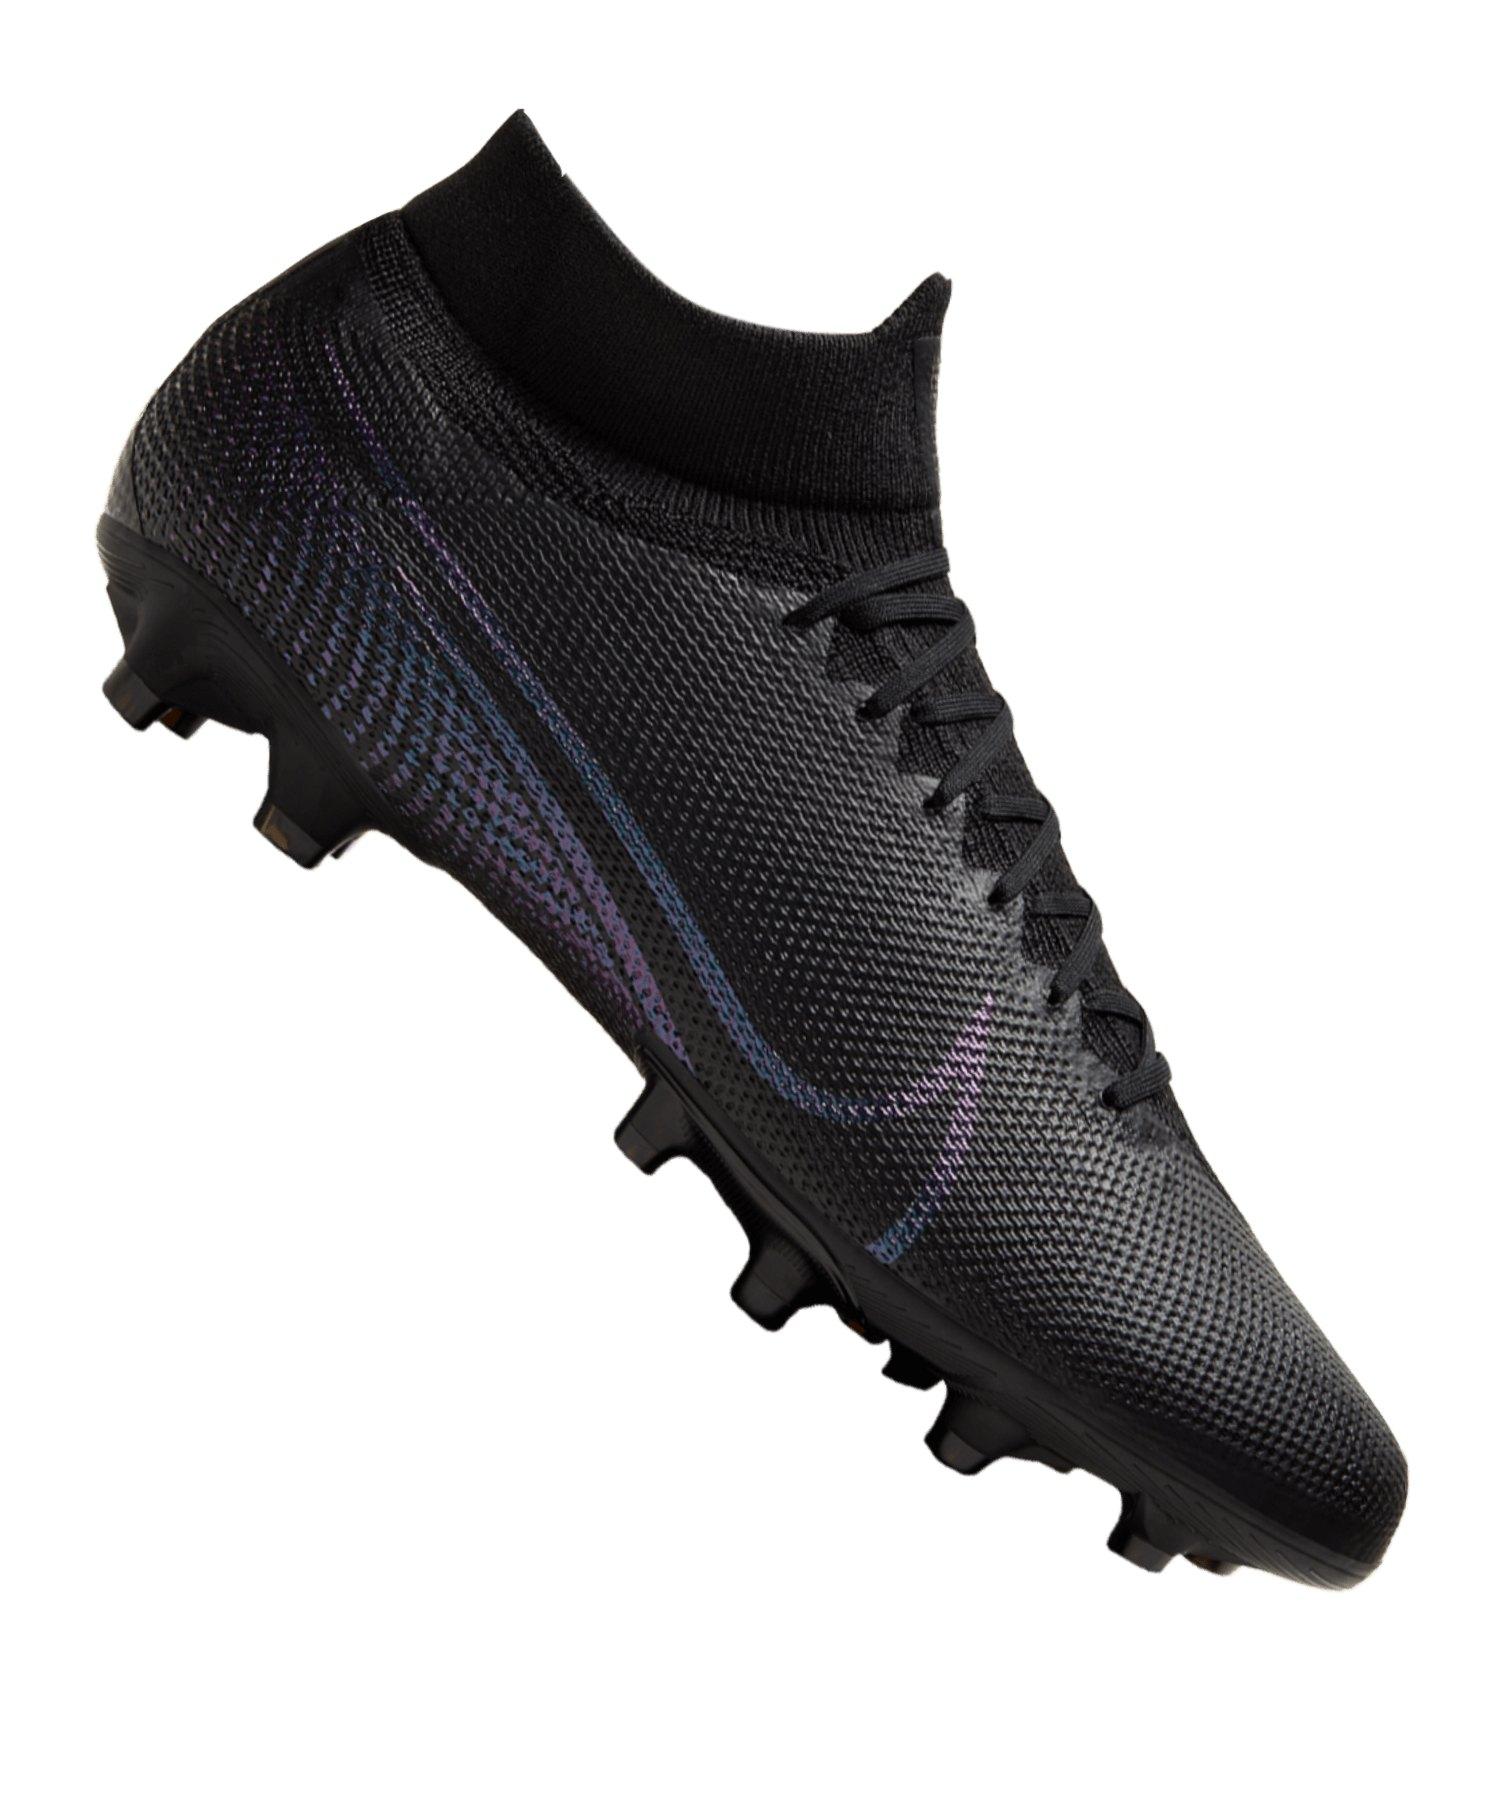 Nike Mercurial Superfly VII Pro AG-Pro F010 - schwarz